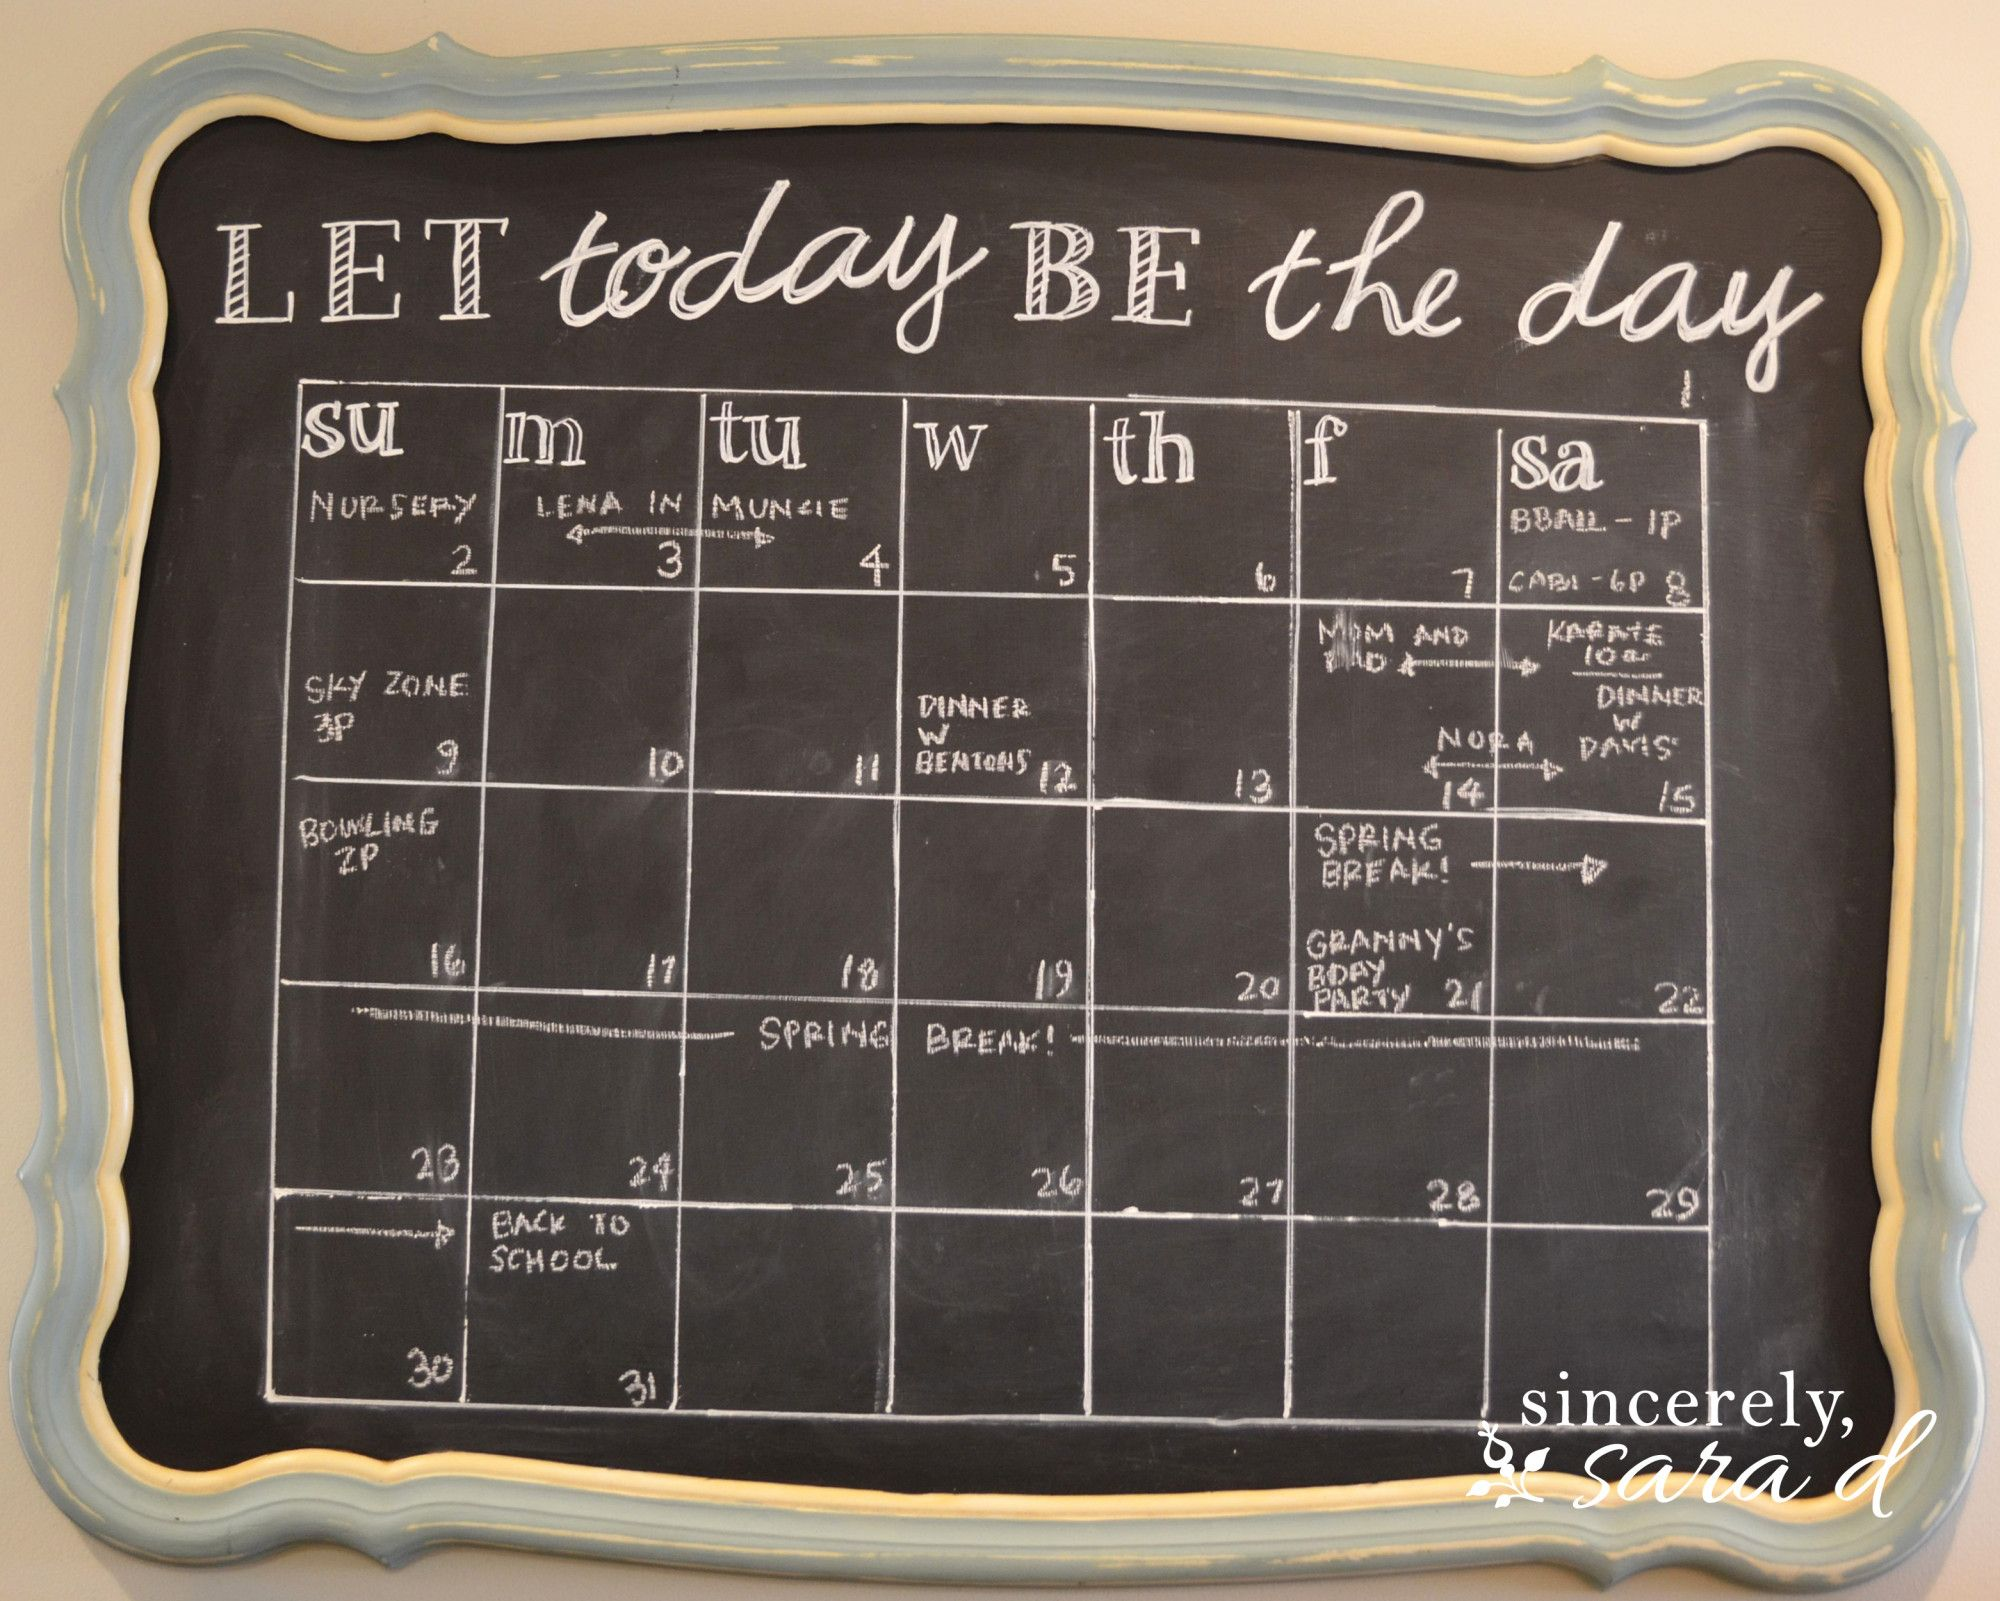 Diy chalkboard calendar sincerely sara d home decor